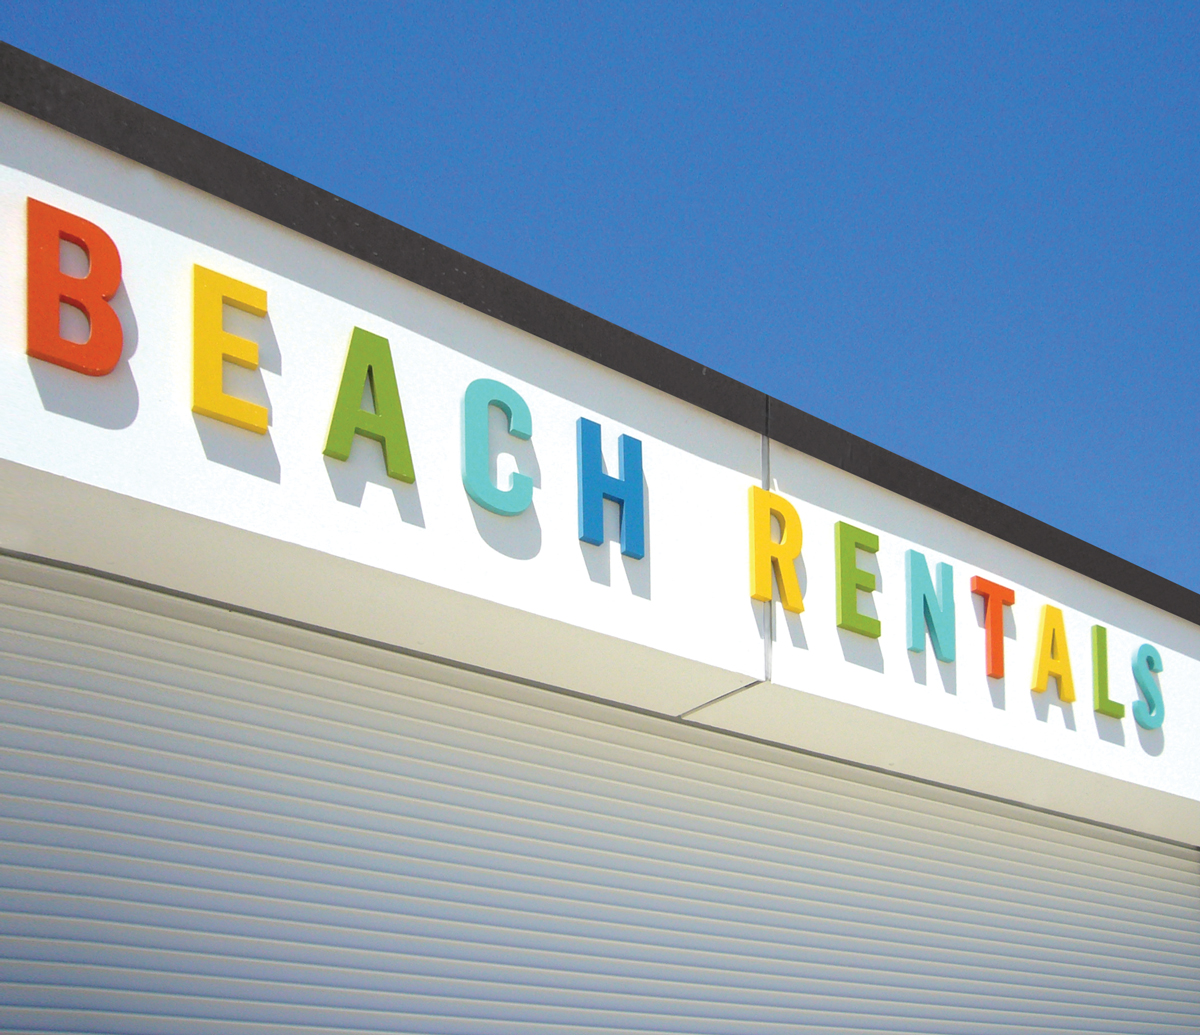 ACBH-BeachRental.jpg